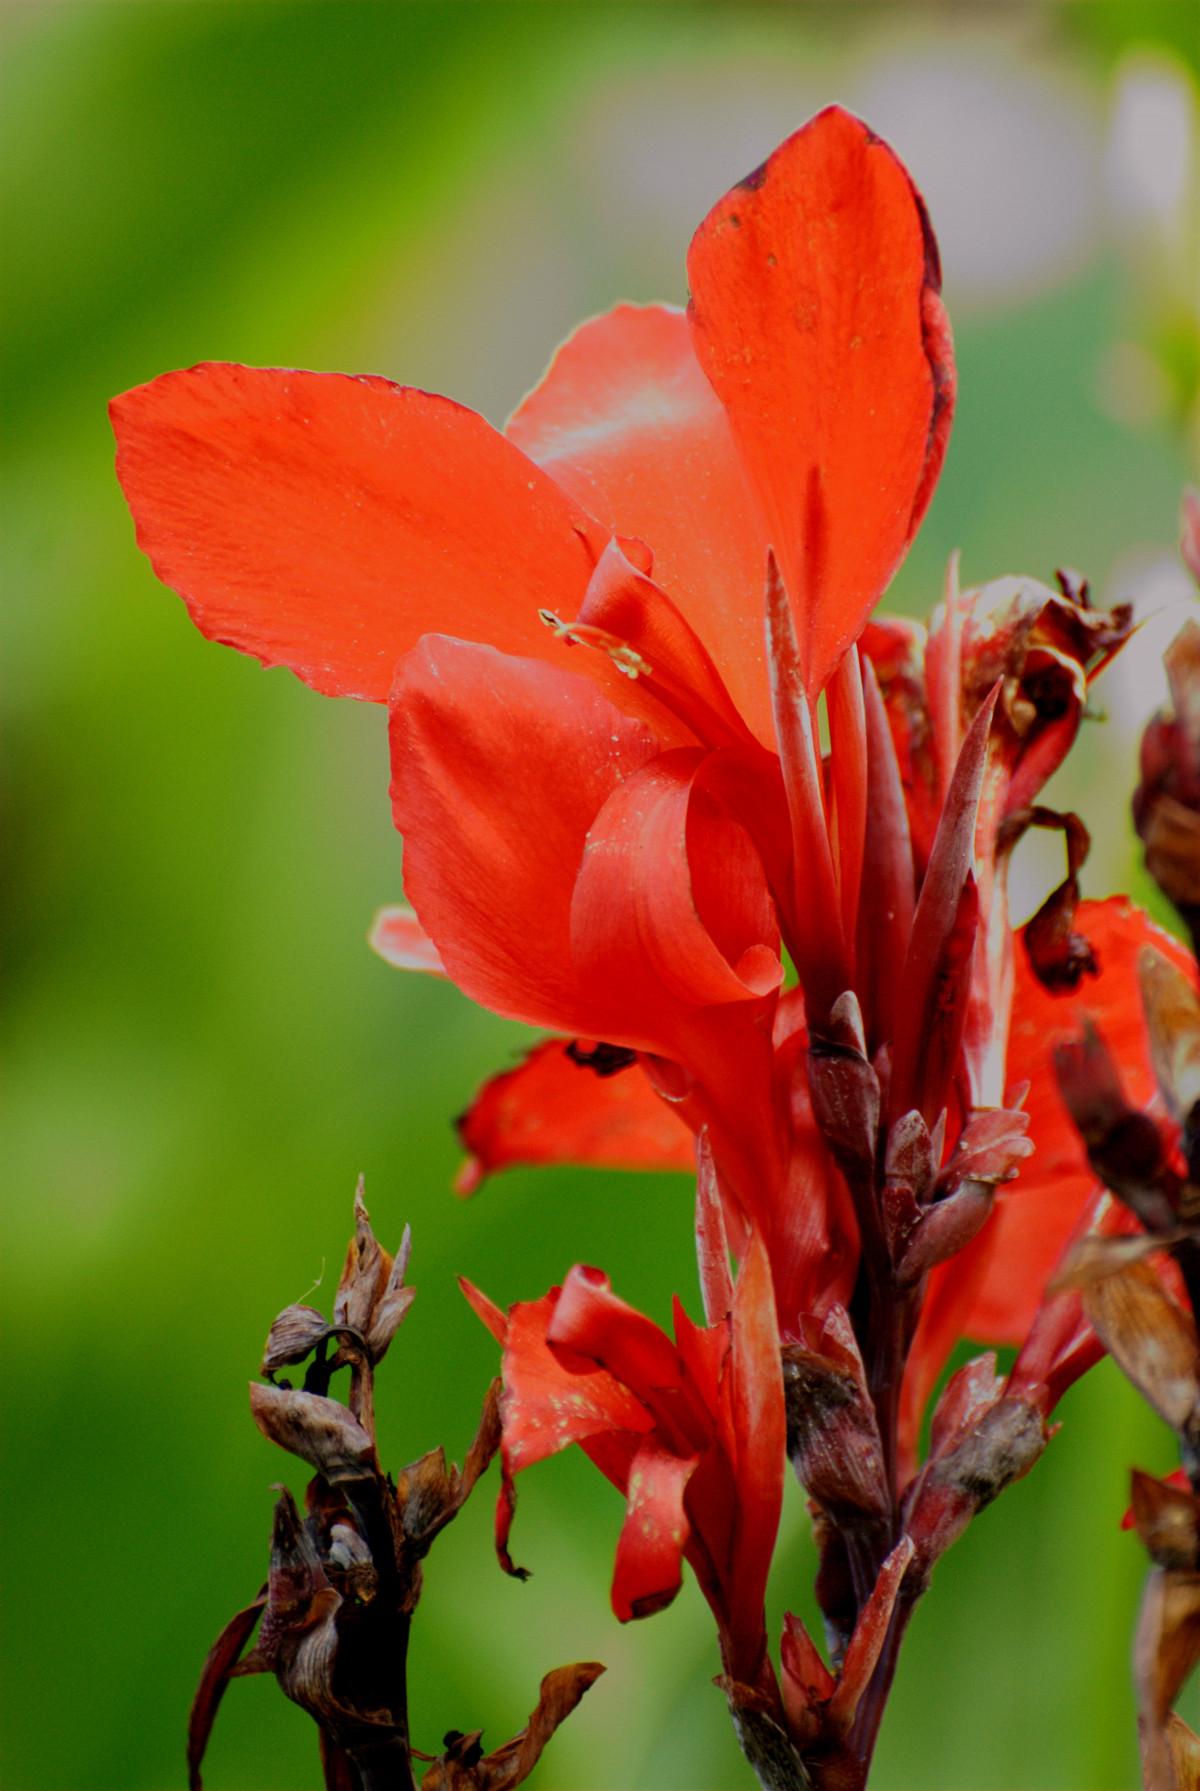 kostenlose foto blatt blume bl tenblatt rot herbst botanik flora wildblume blumen. Black Bedroom Furniture Sets. Home Design Ideas